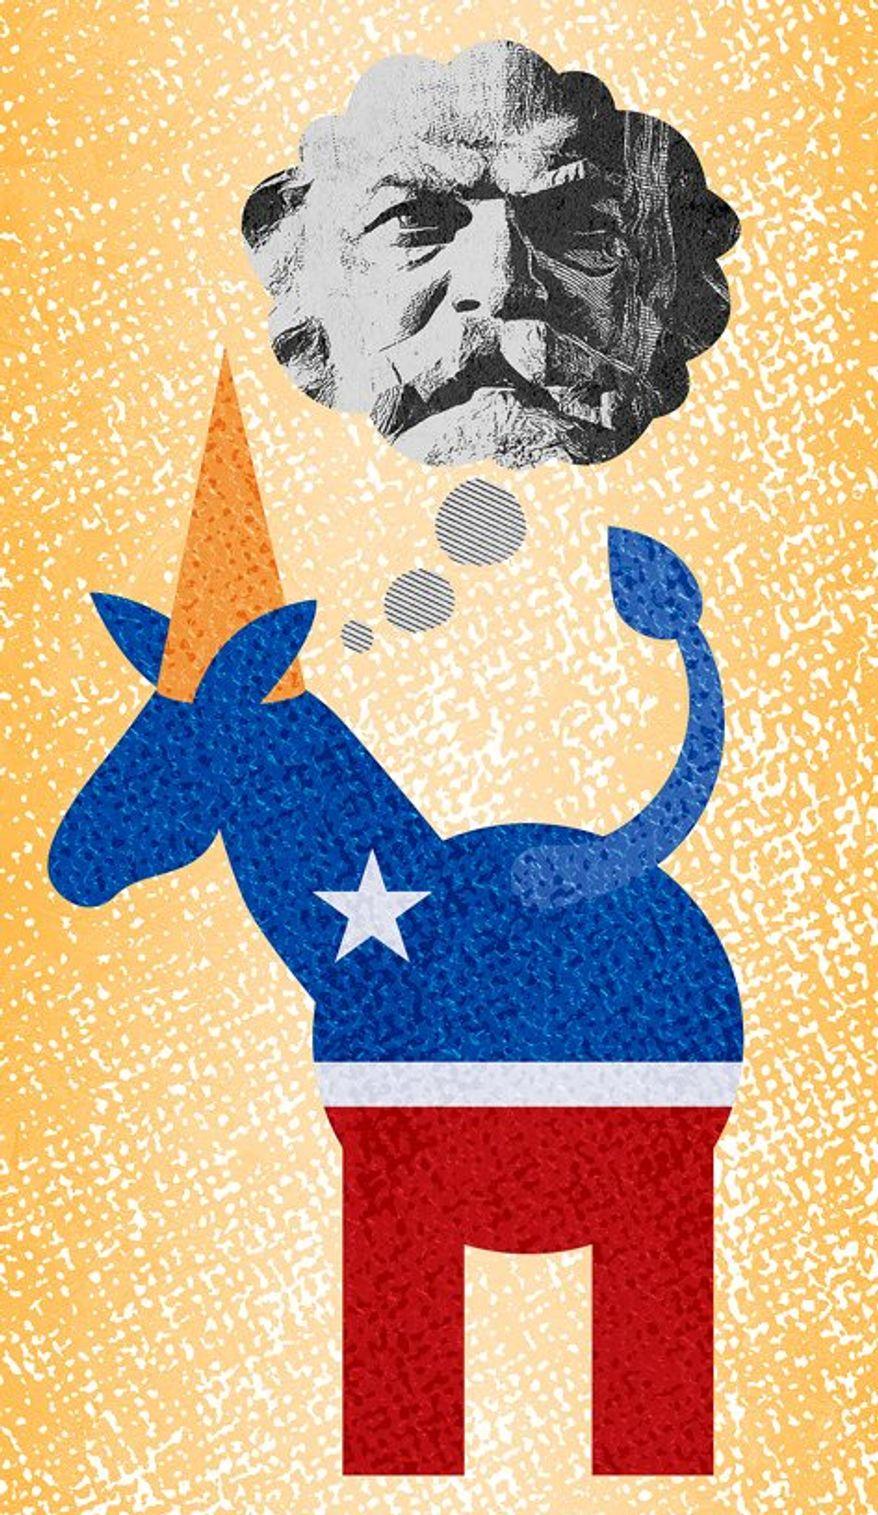 Bad Idea Illustration by Greg Groesch/The Washington Times